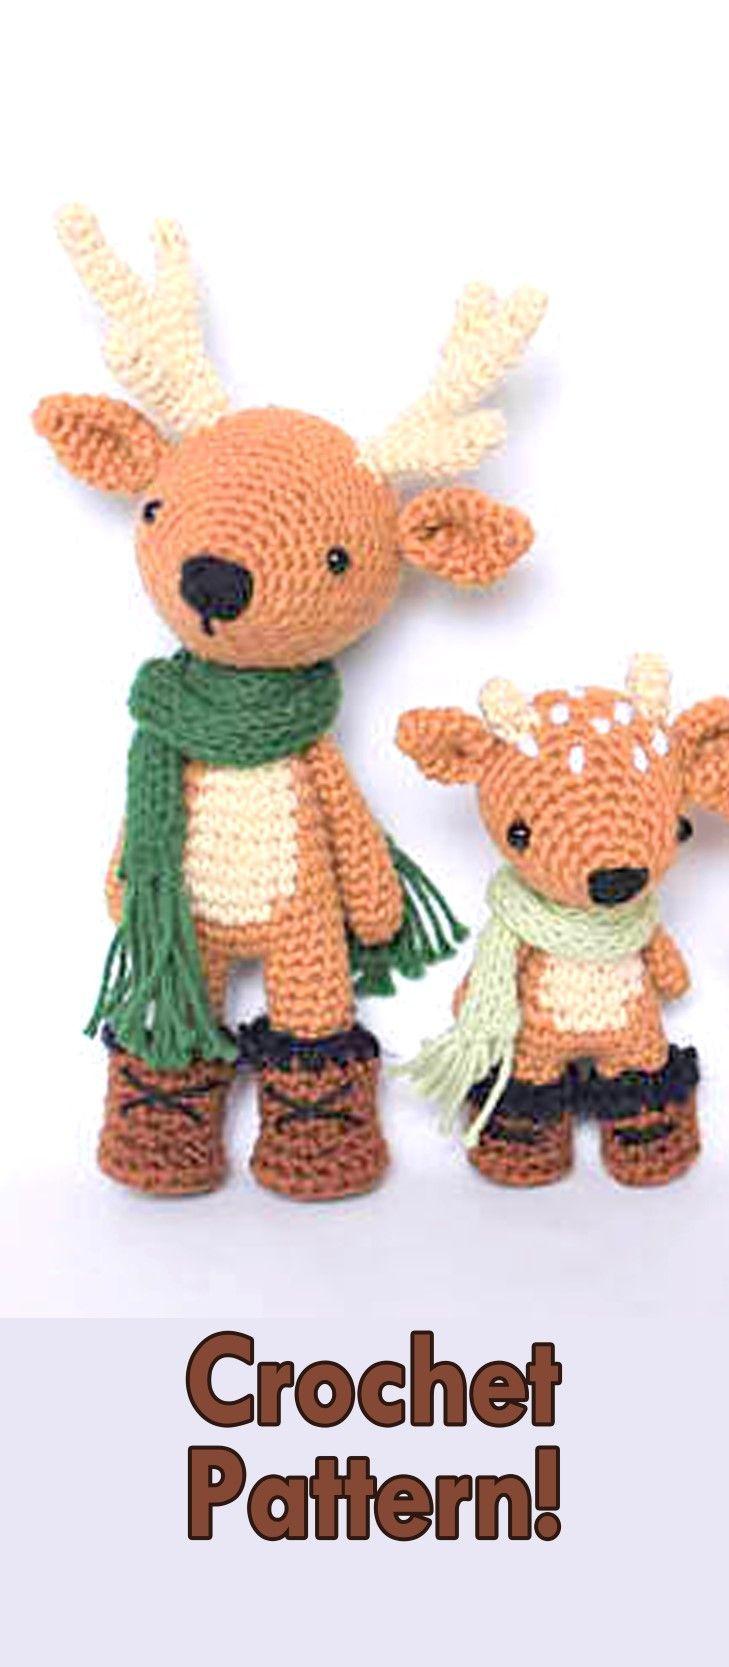 Sleepy Sheep Patterns! | Crochet and Patterns